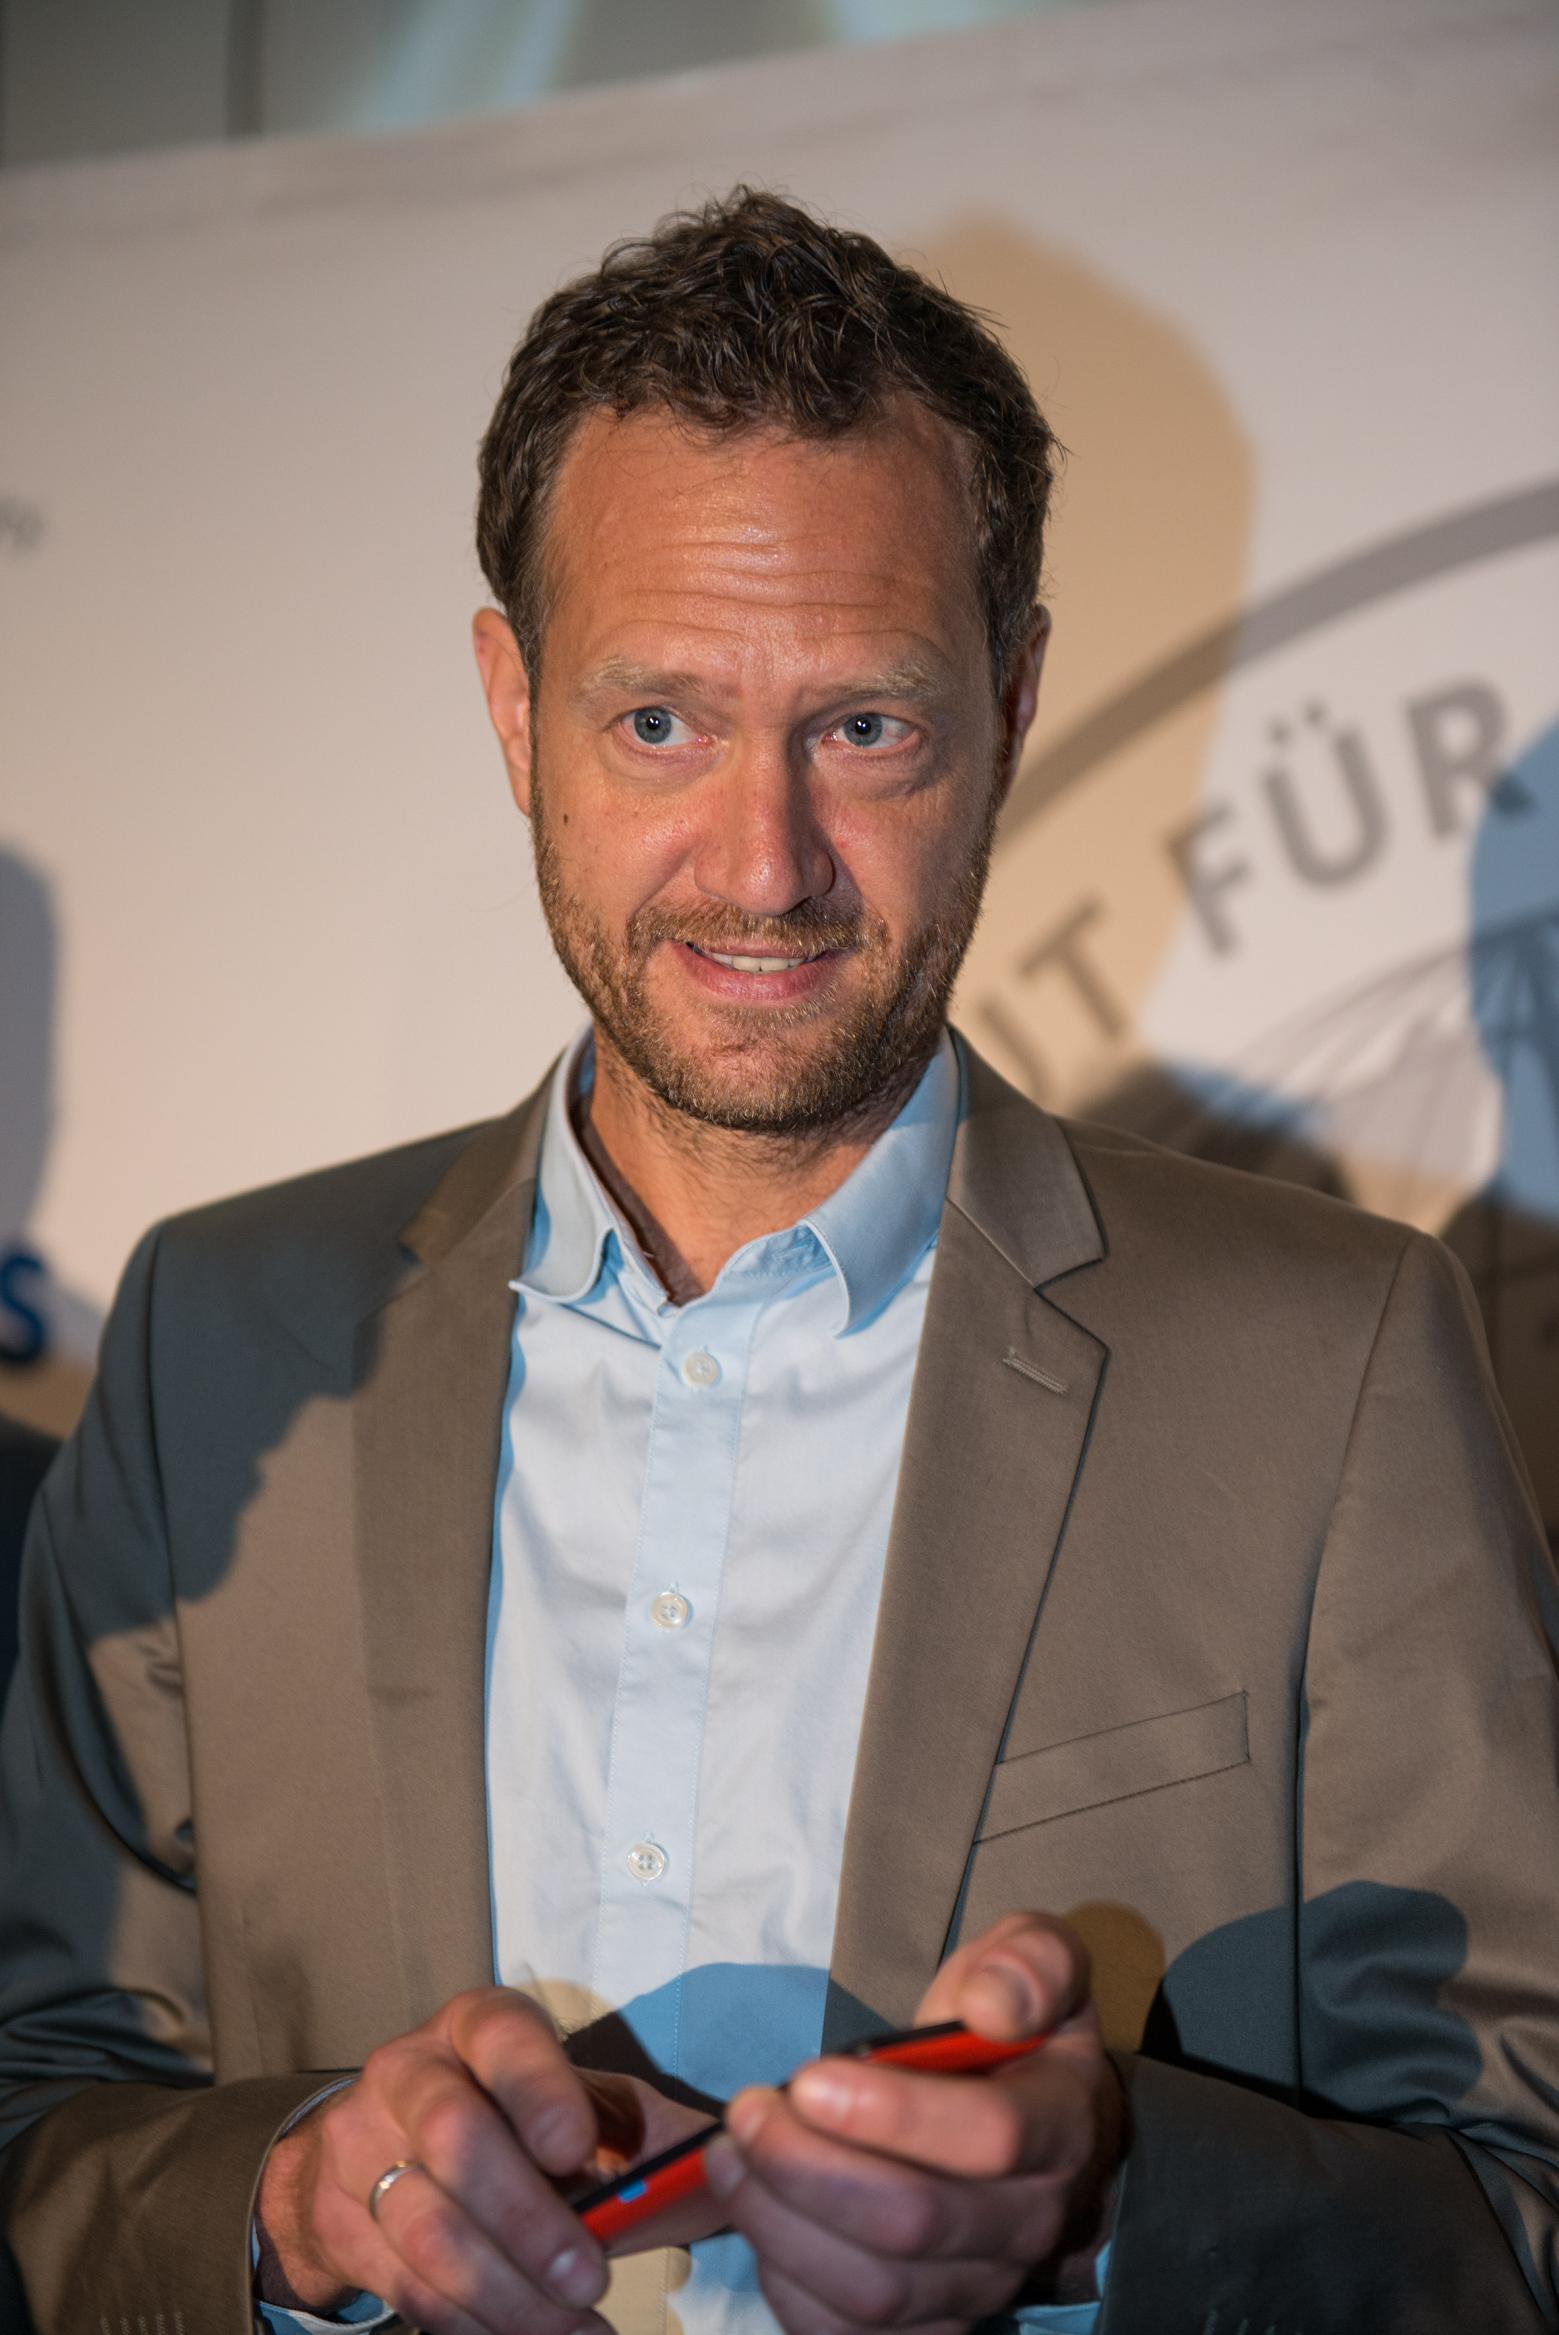 Bas van Abel CEO Fairphone at Kiel Prize